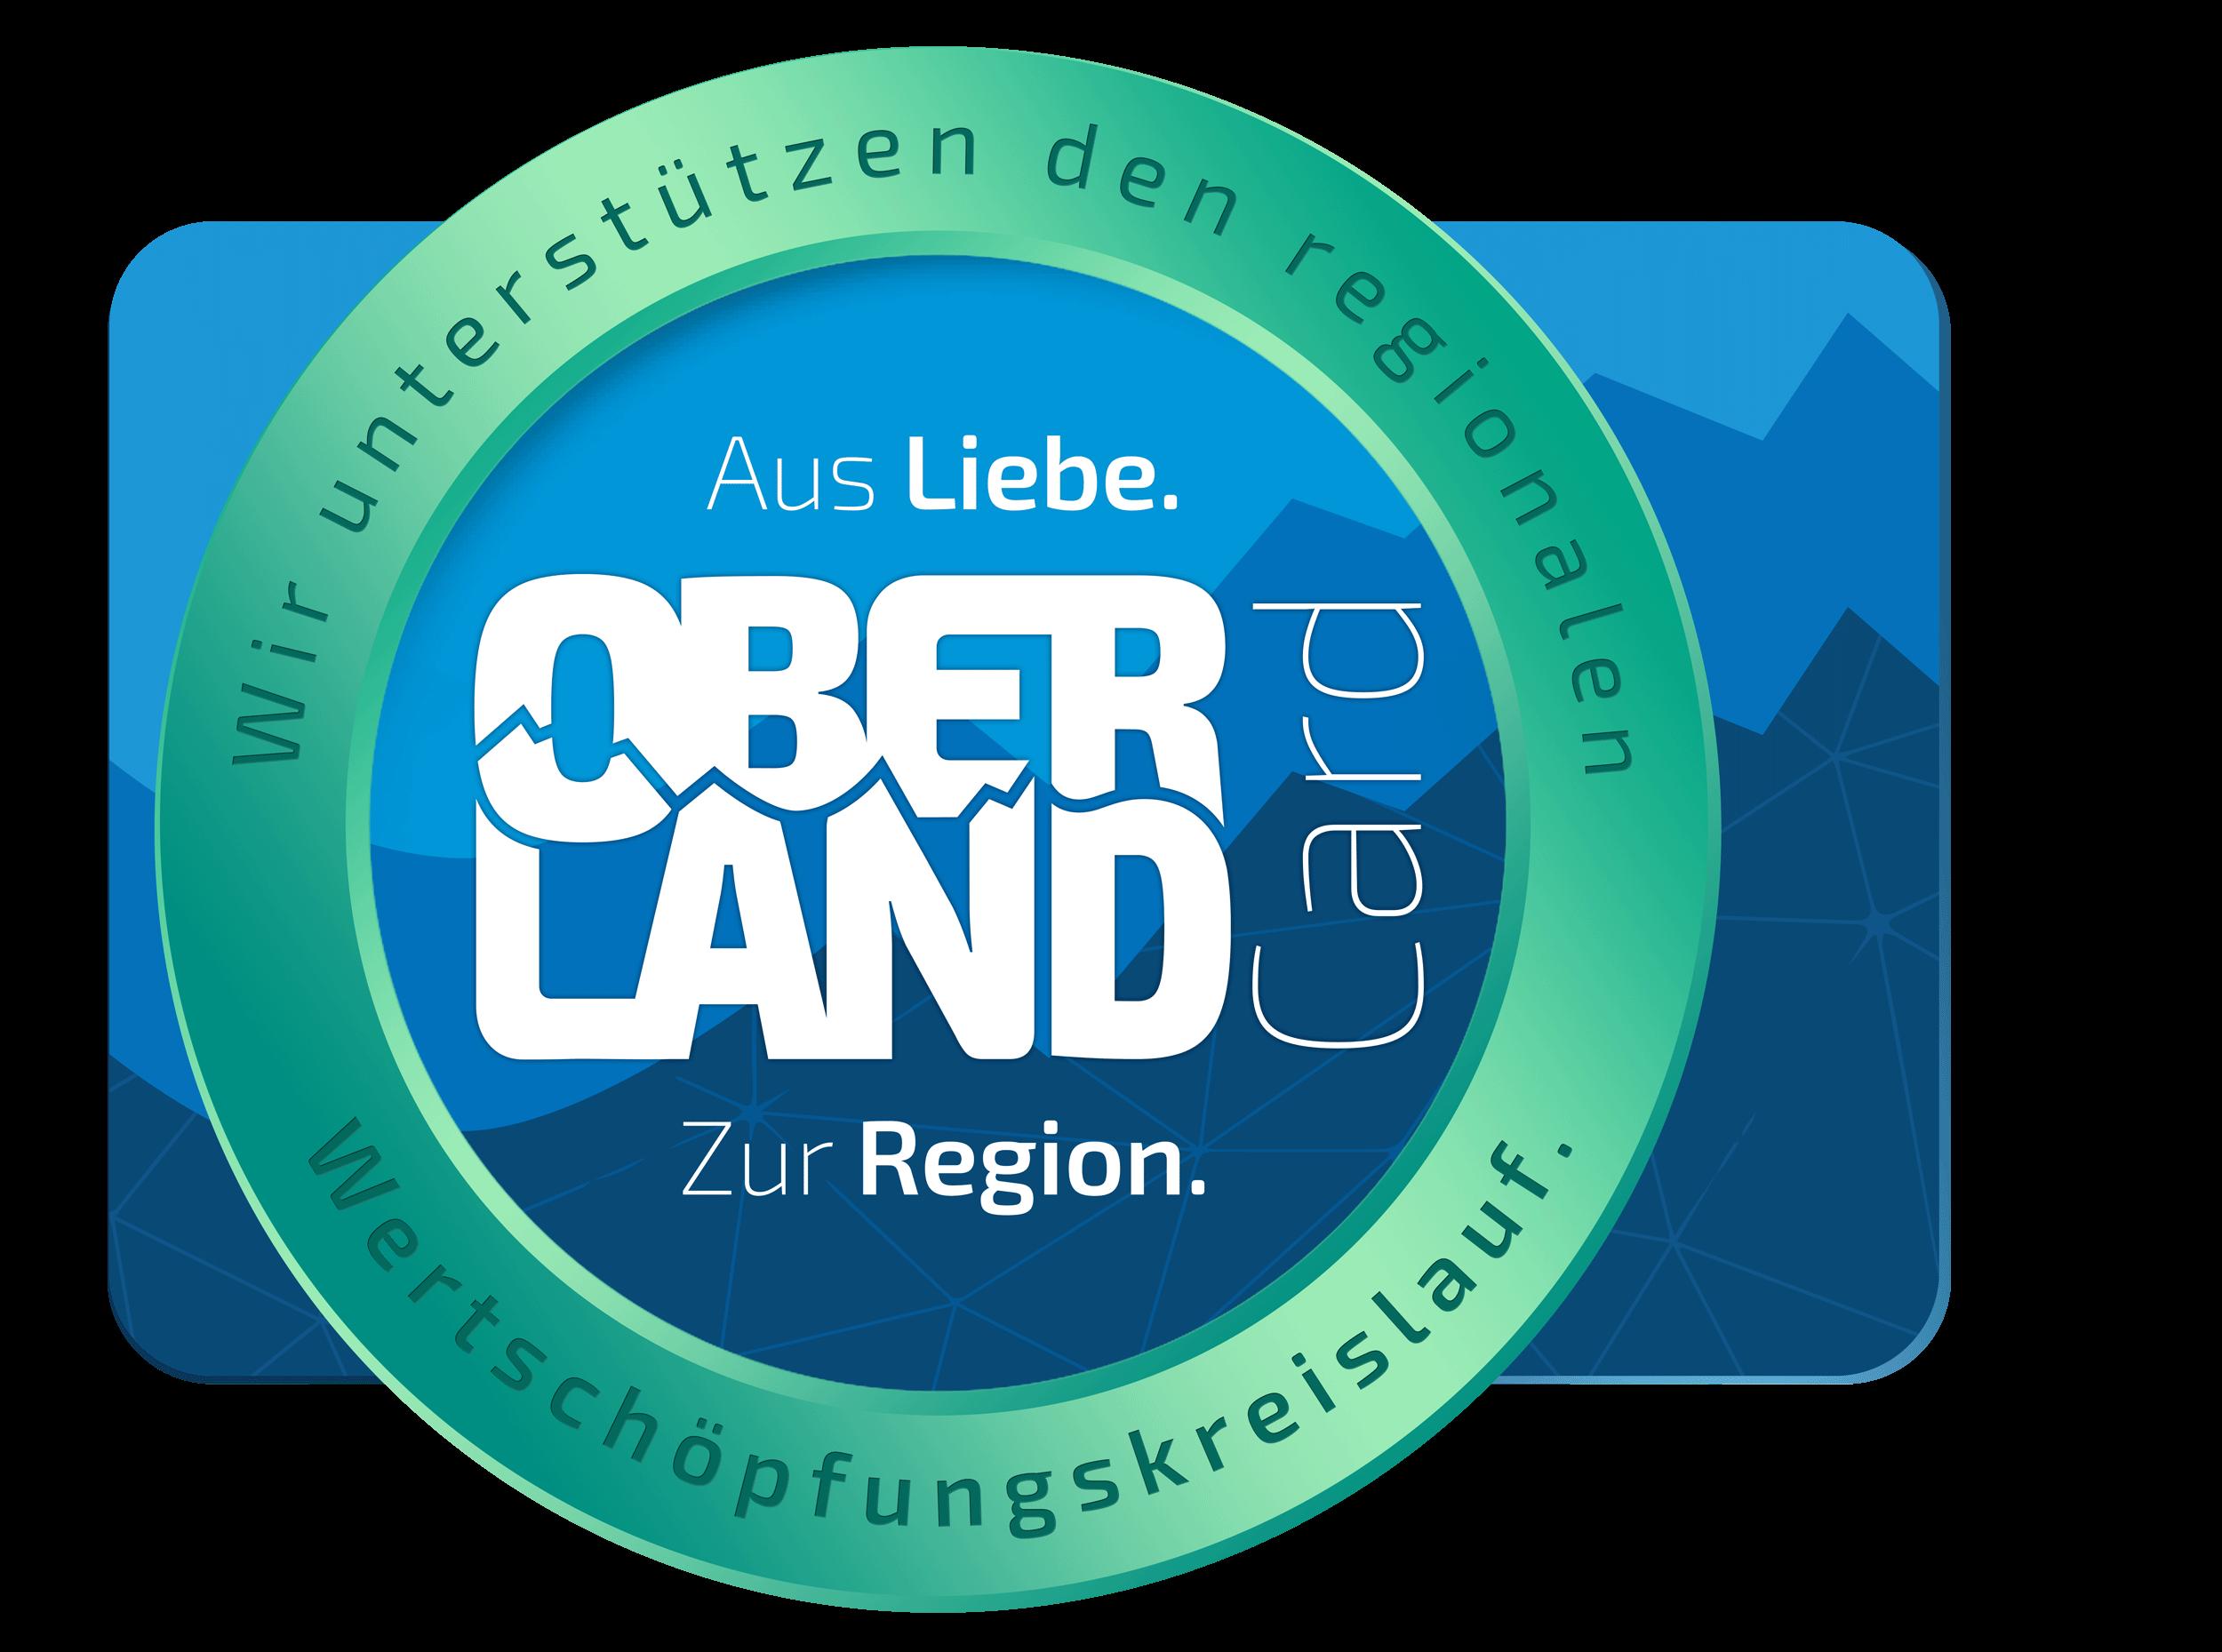 OBERLANDCard_Qualitätssiege_SMG2021